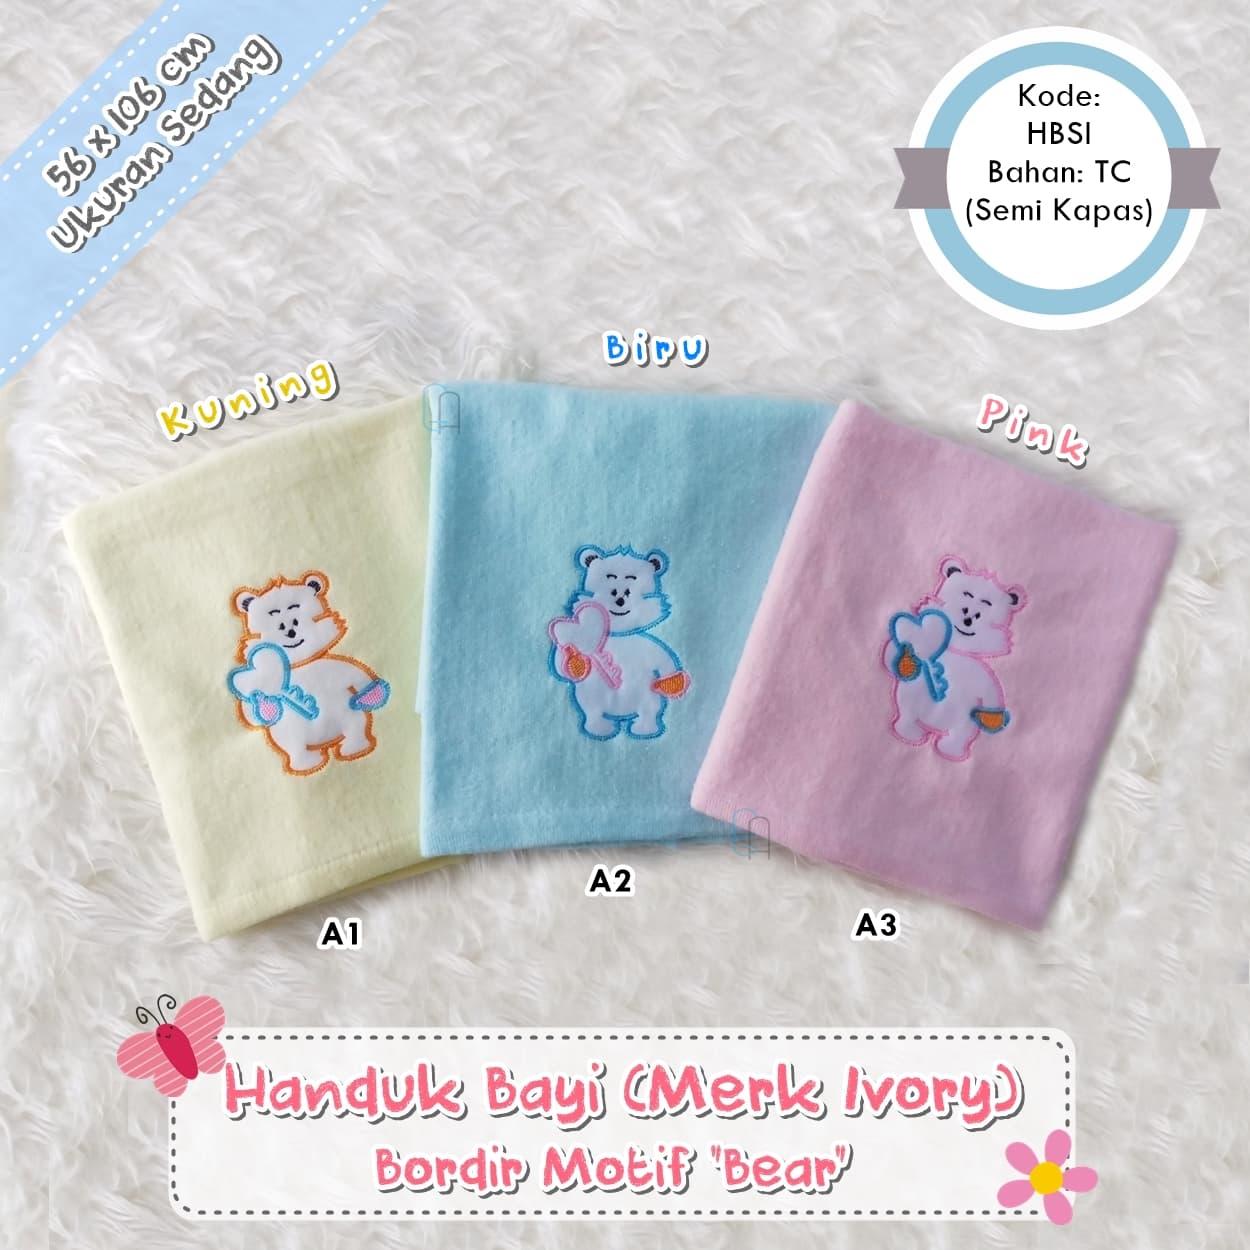 Jual Set 3pcs Setelan Baju Bayi Newborn Celana Panjang Polos Warna Tanpa Tempat Diapers Handuk Bordir Ivory Rp 22000 3 Pcs